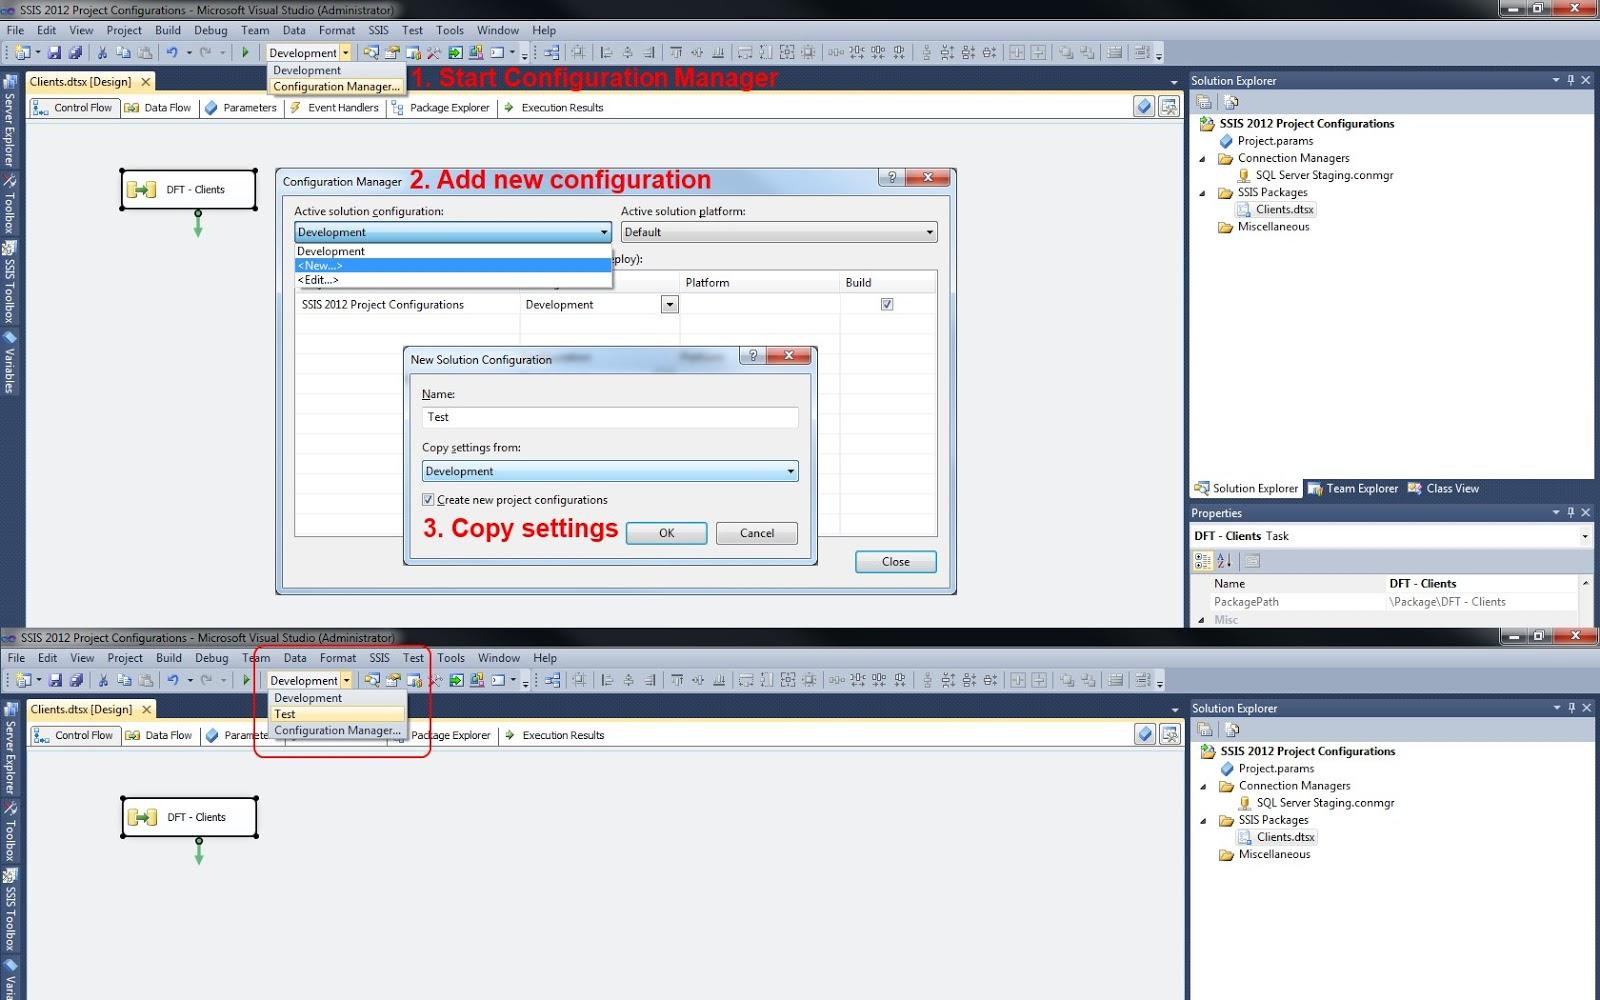 Microsoft SQL Server Integration Services: Multiple Configurations